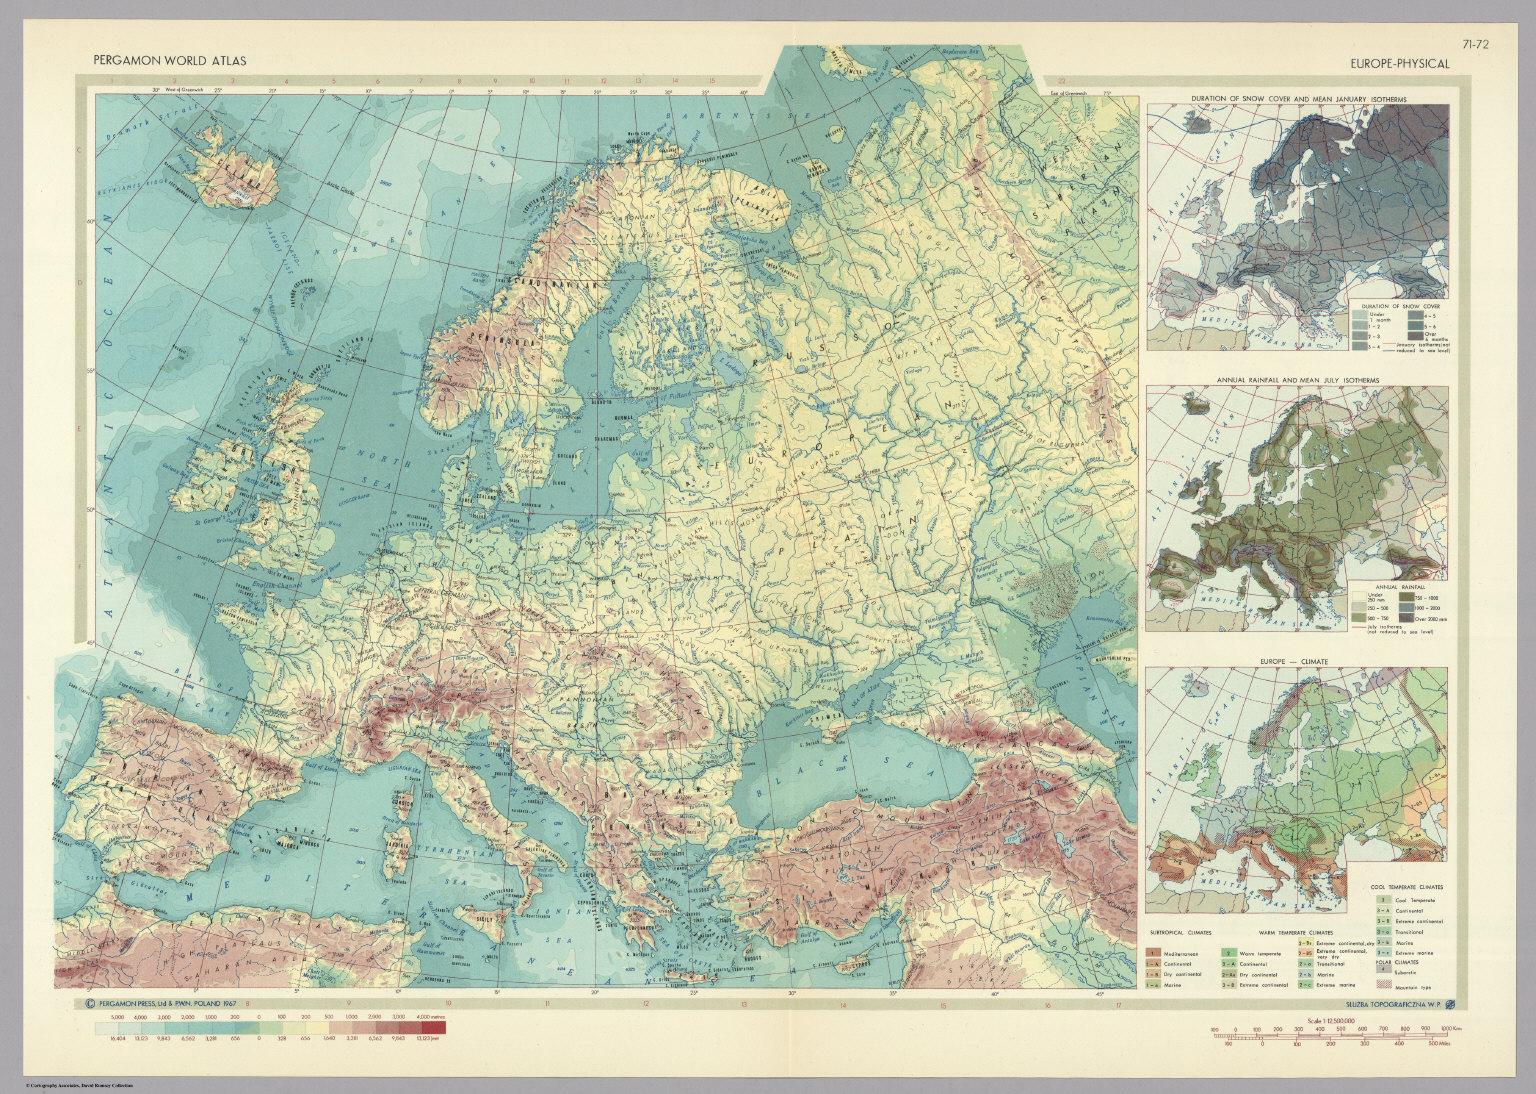 Europe physical pergamon world atlas david rumsey historical pergamon world atlas gumiabroncs Image collections